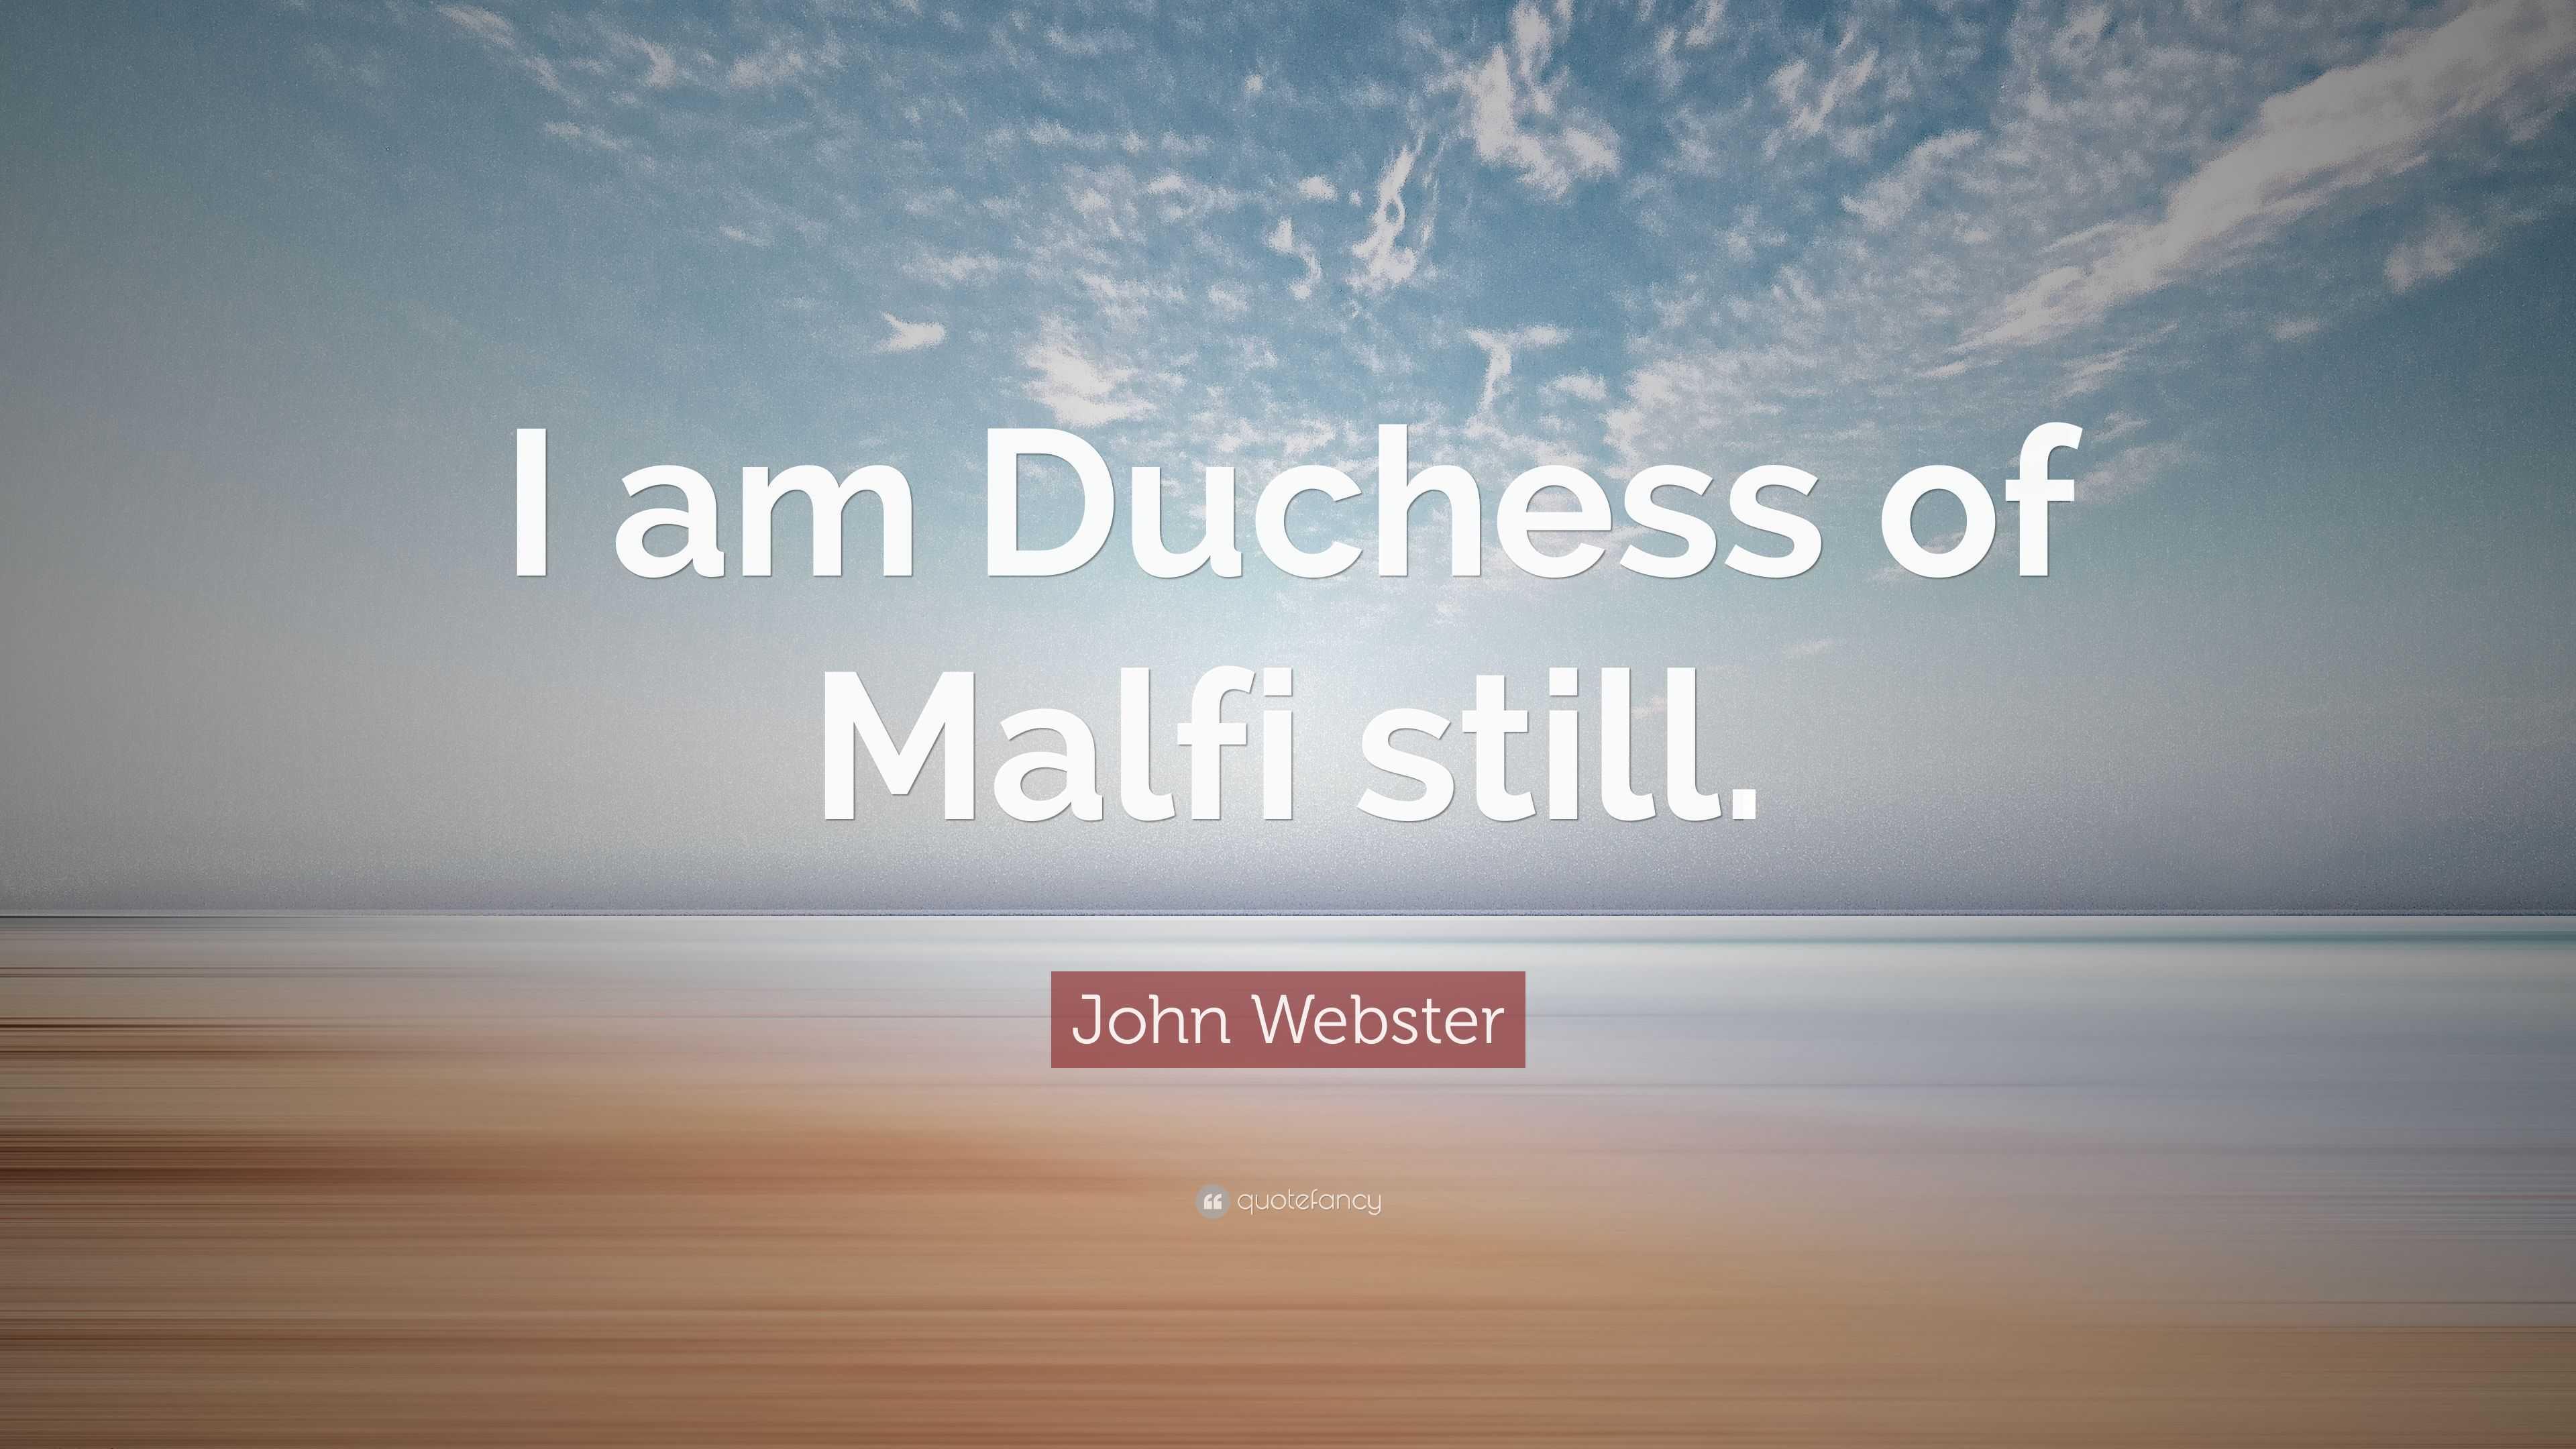 i am the duchess of malfi still